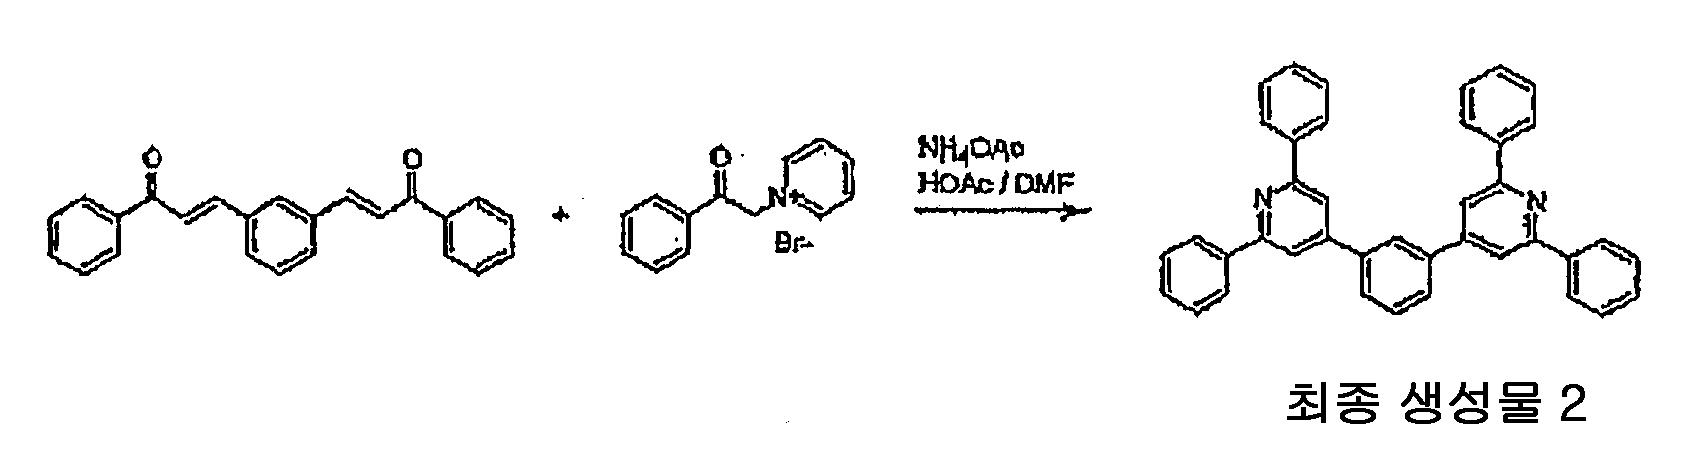 Figure 112010002231902-pat00094